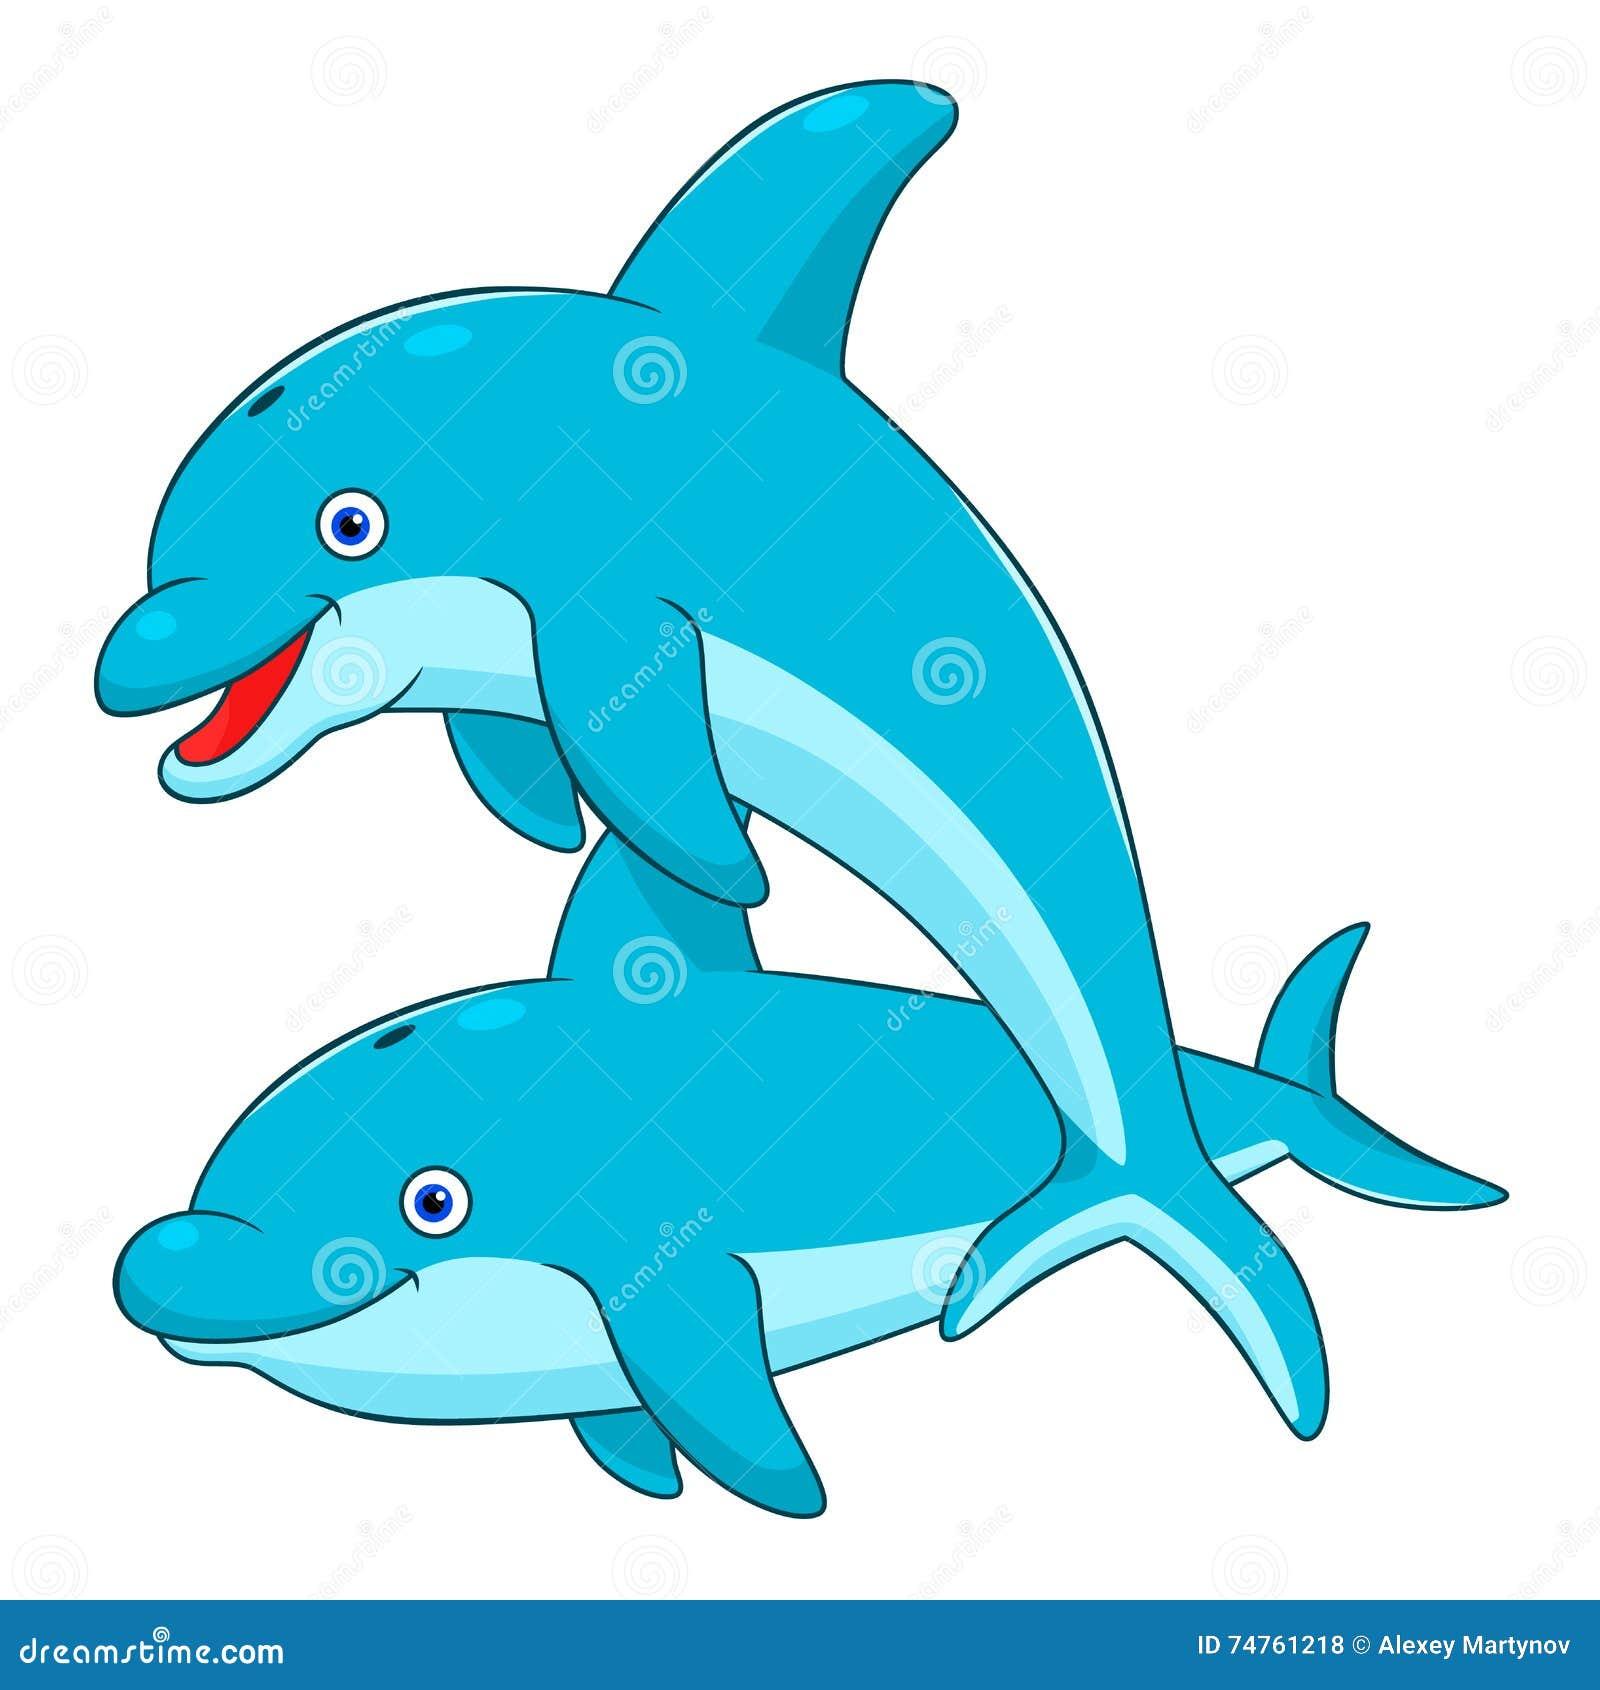 Cartoon dolphins stock vector. Illustration of life ...